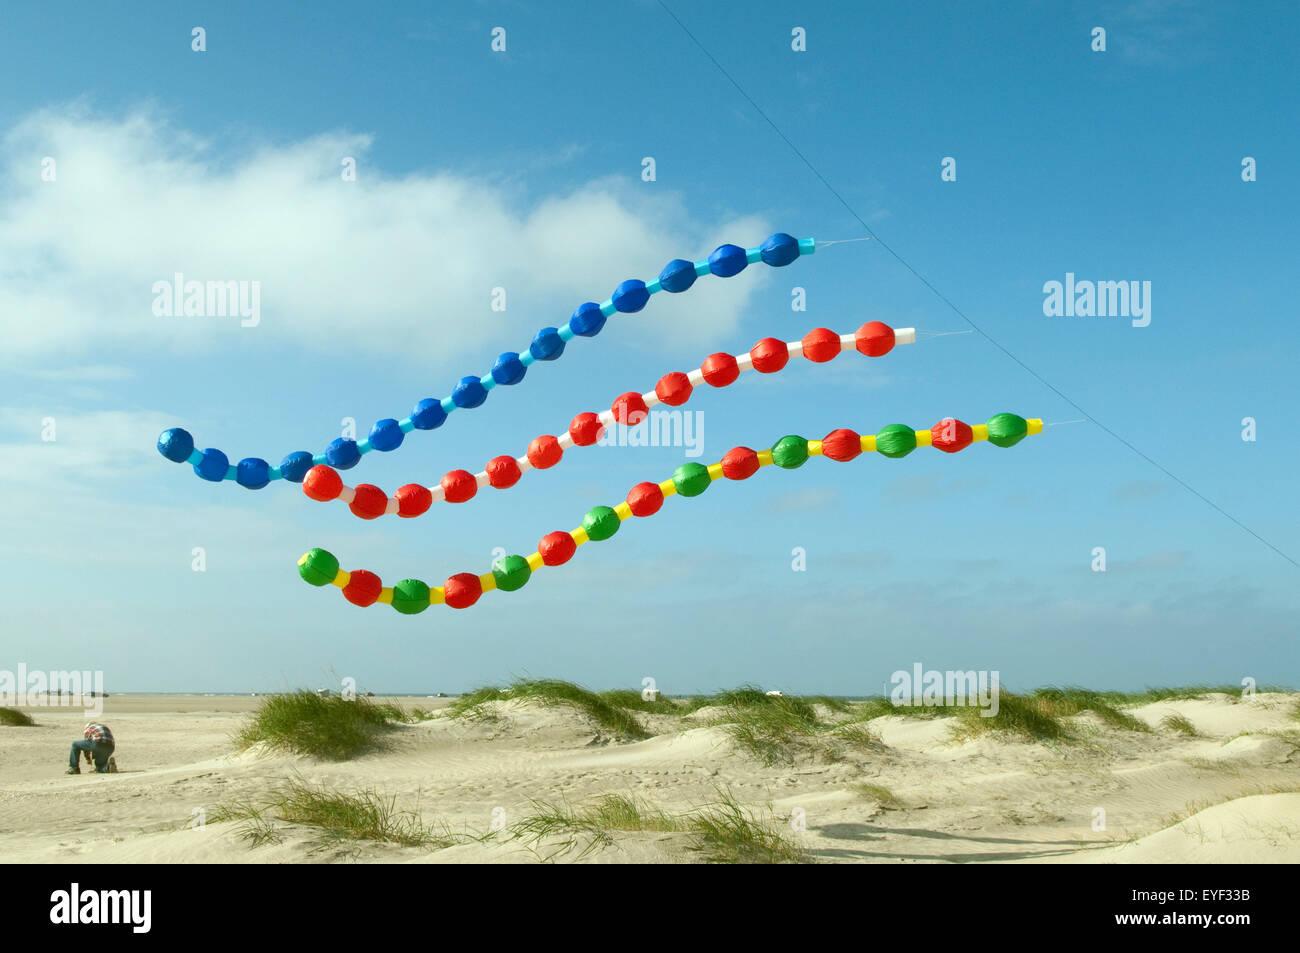 Drachen, Grossdrachen, Winddrachen, - Stock Image